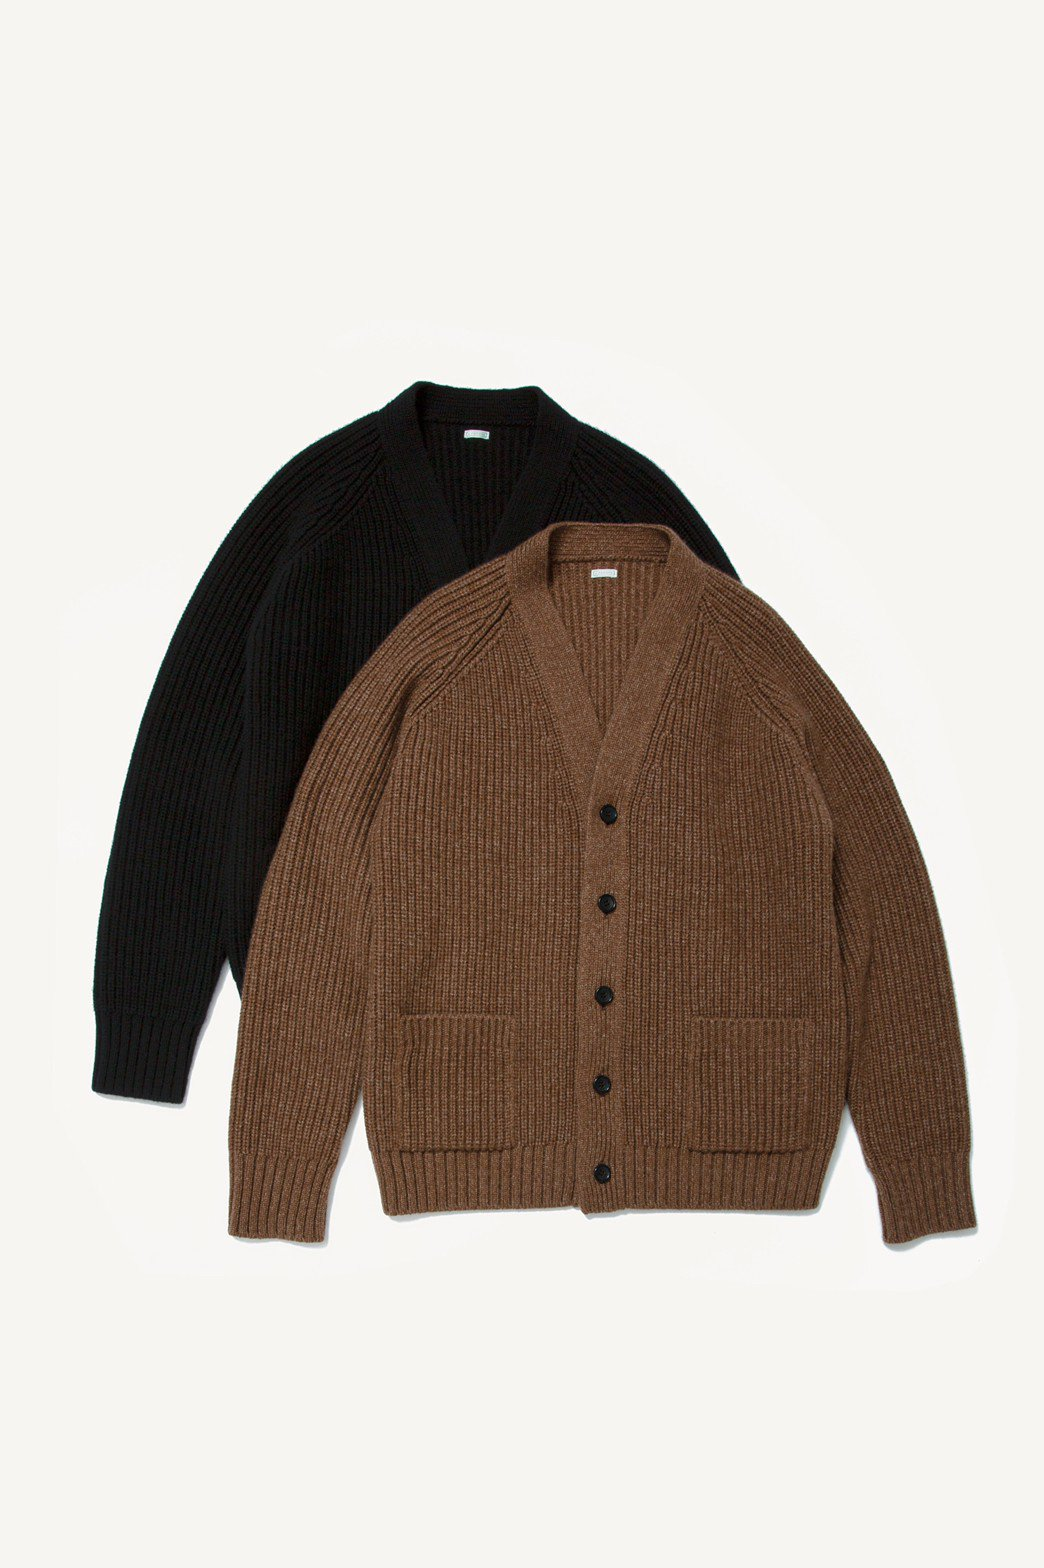 A.PRESSE / Fisherman Cardigan Sweater